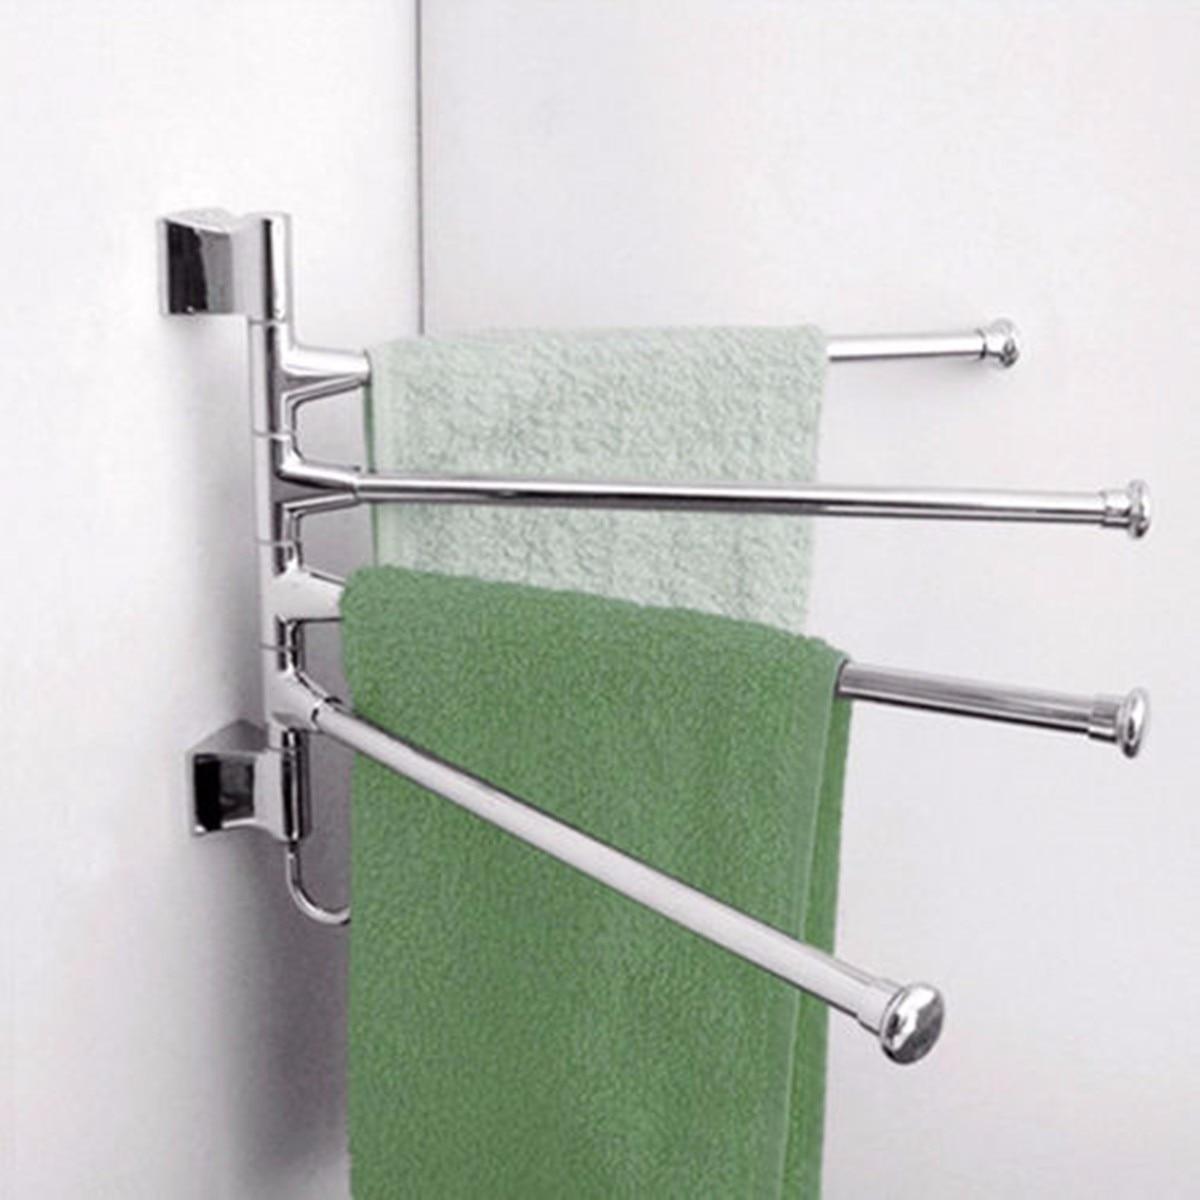 popular swivel towel rackbuy cheap swivel towel rack lots from  -  lyer wall mounted bathroom towel rack swivel towel clothes storage holdershelf stainless steel towel